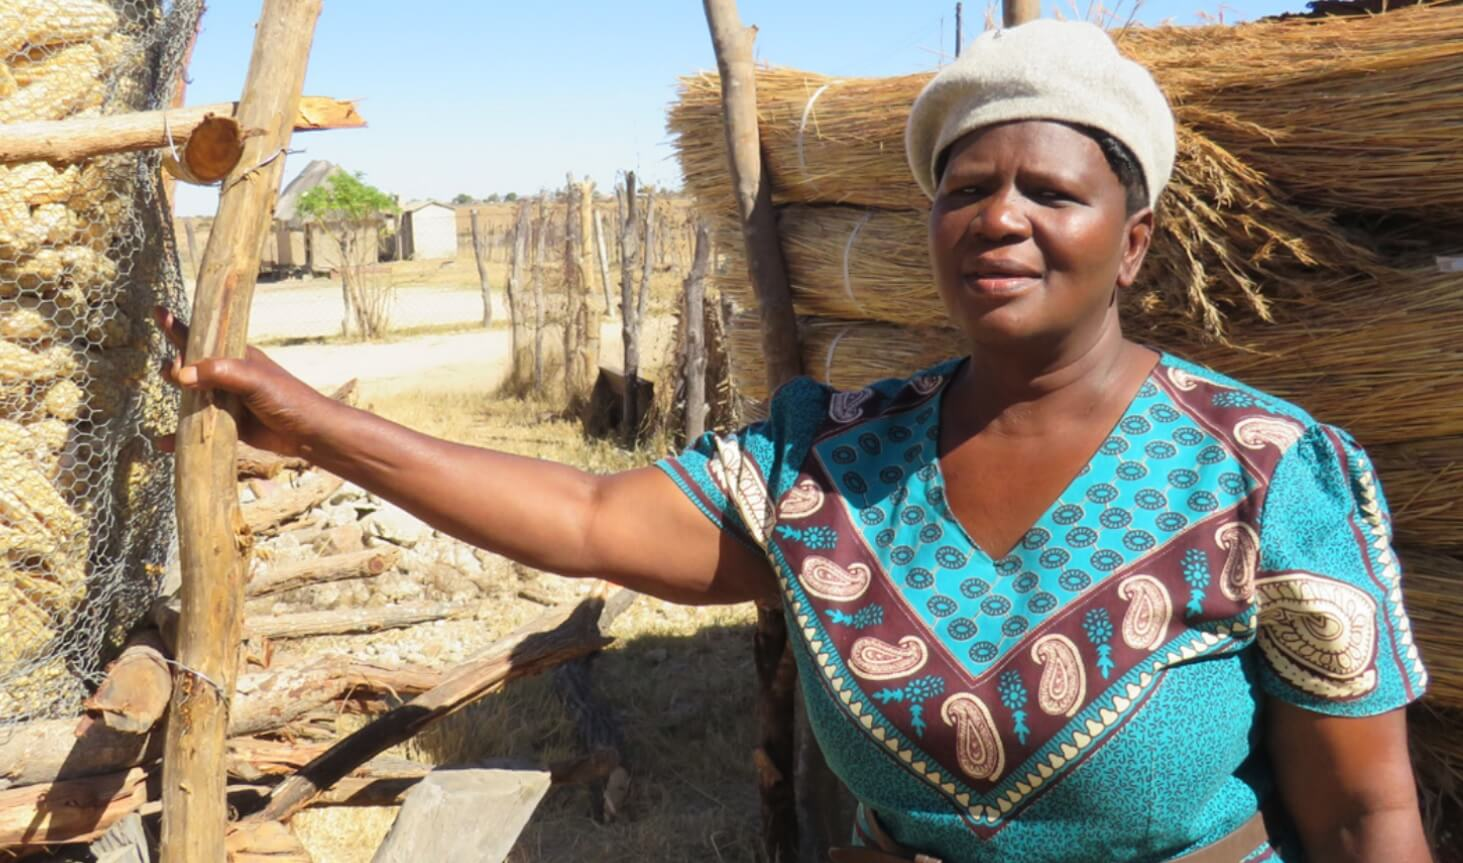 Caption : Councillor of Ward 18, Insiza District, Zimbabwe, Jostina Ndondo, who has supported women advocacy groups. Credit: Nyasha Sanie (Zimbabwe Lawyers for Human Rights)